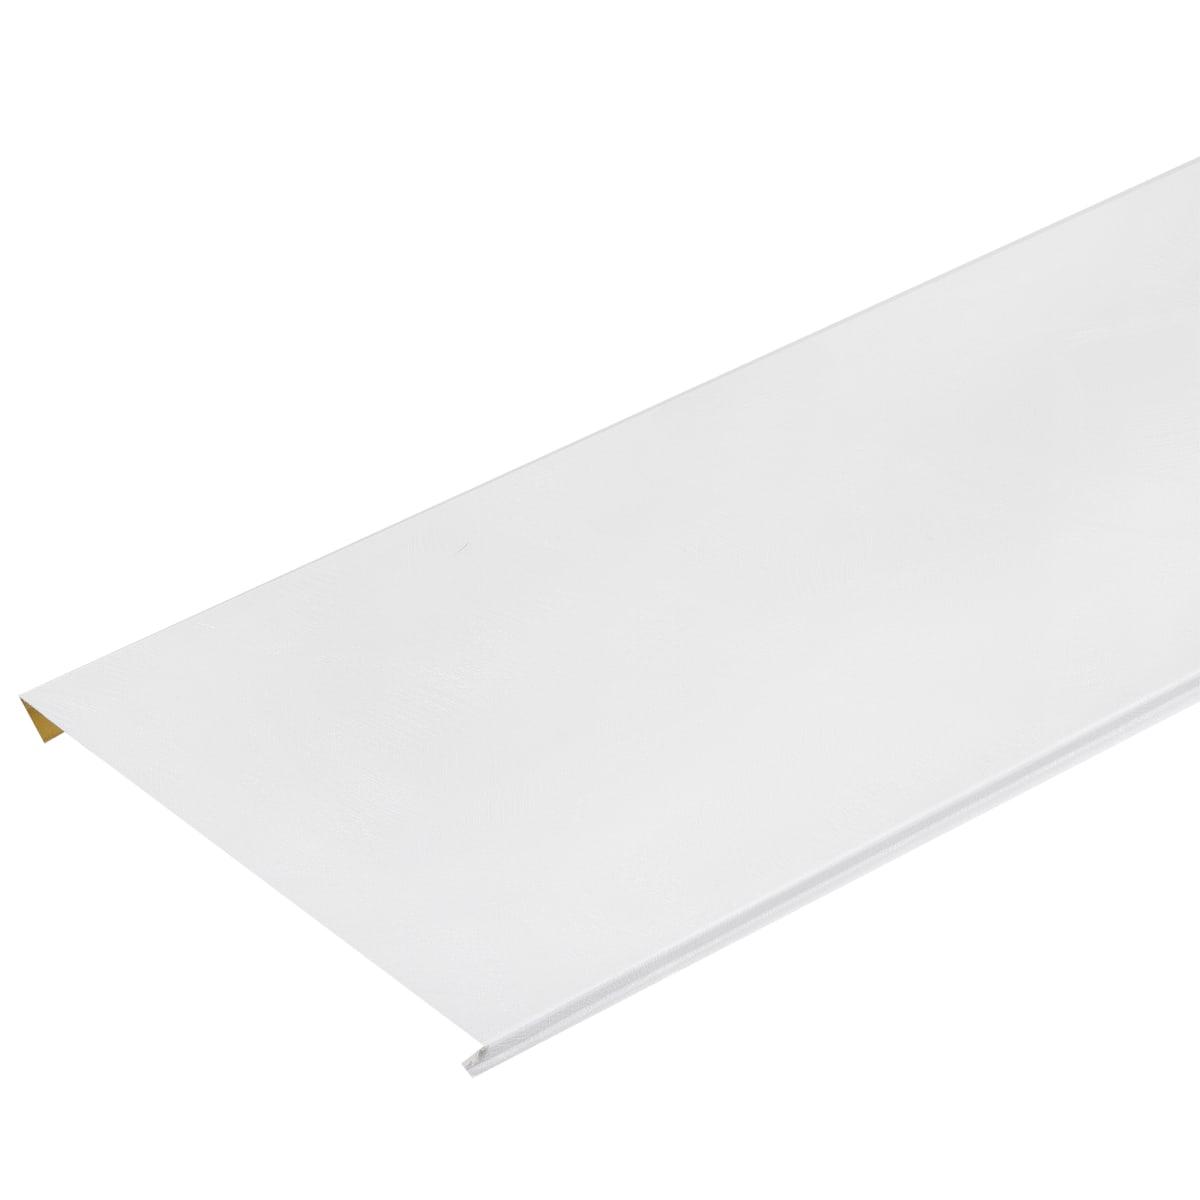 Набор реек 2.5х1.05 м цвет белый шёлк